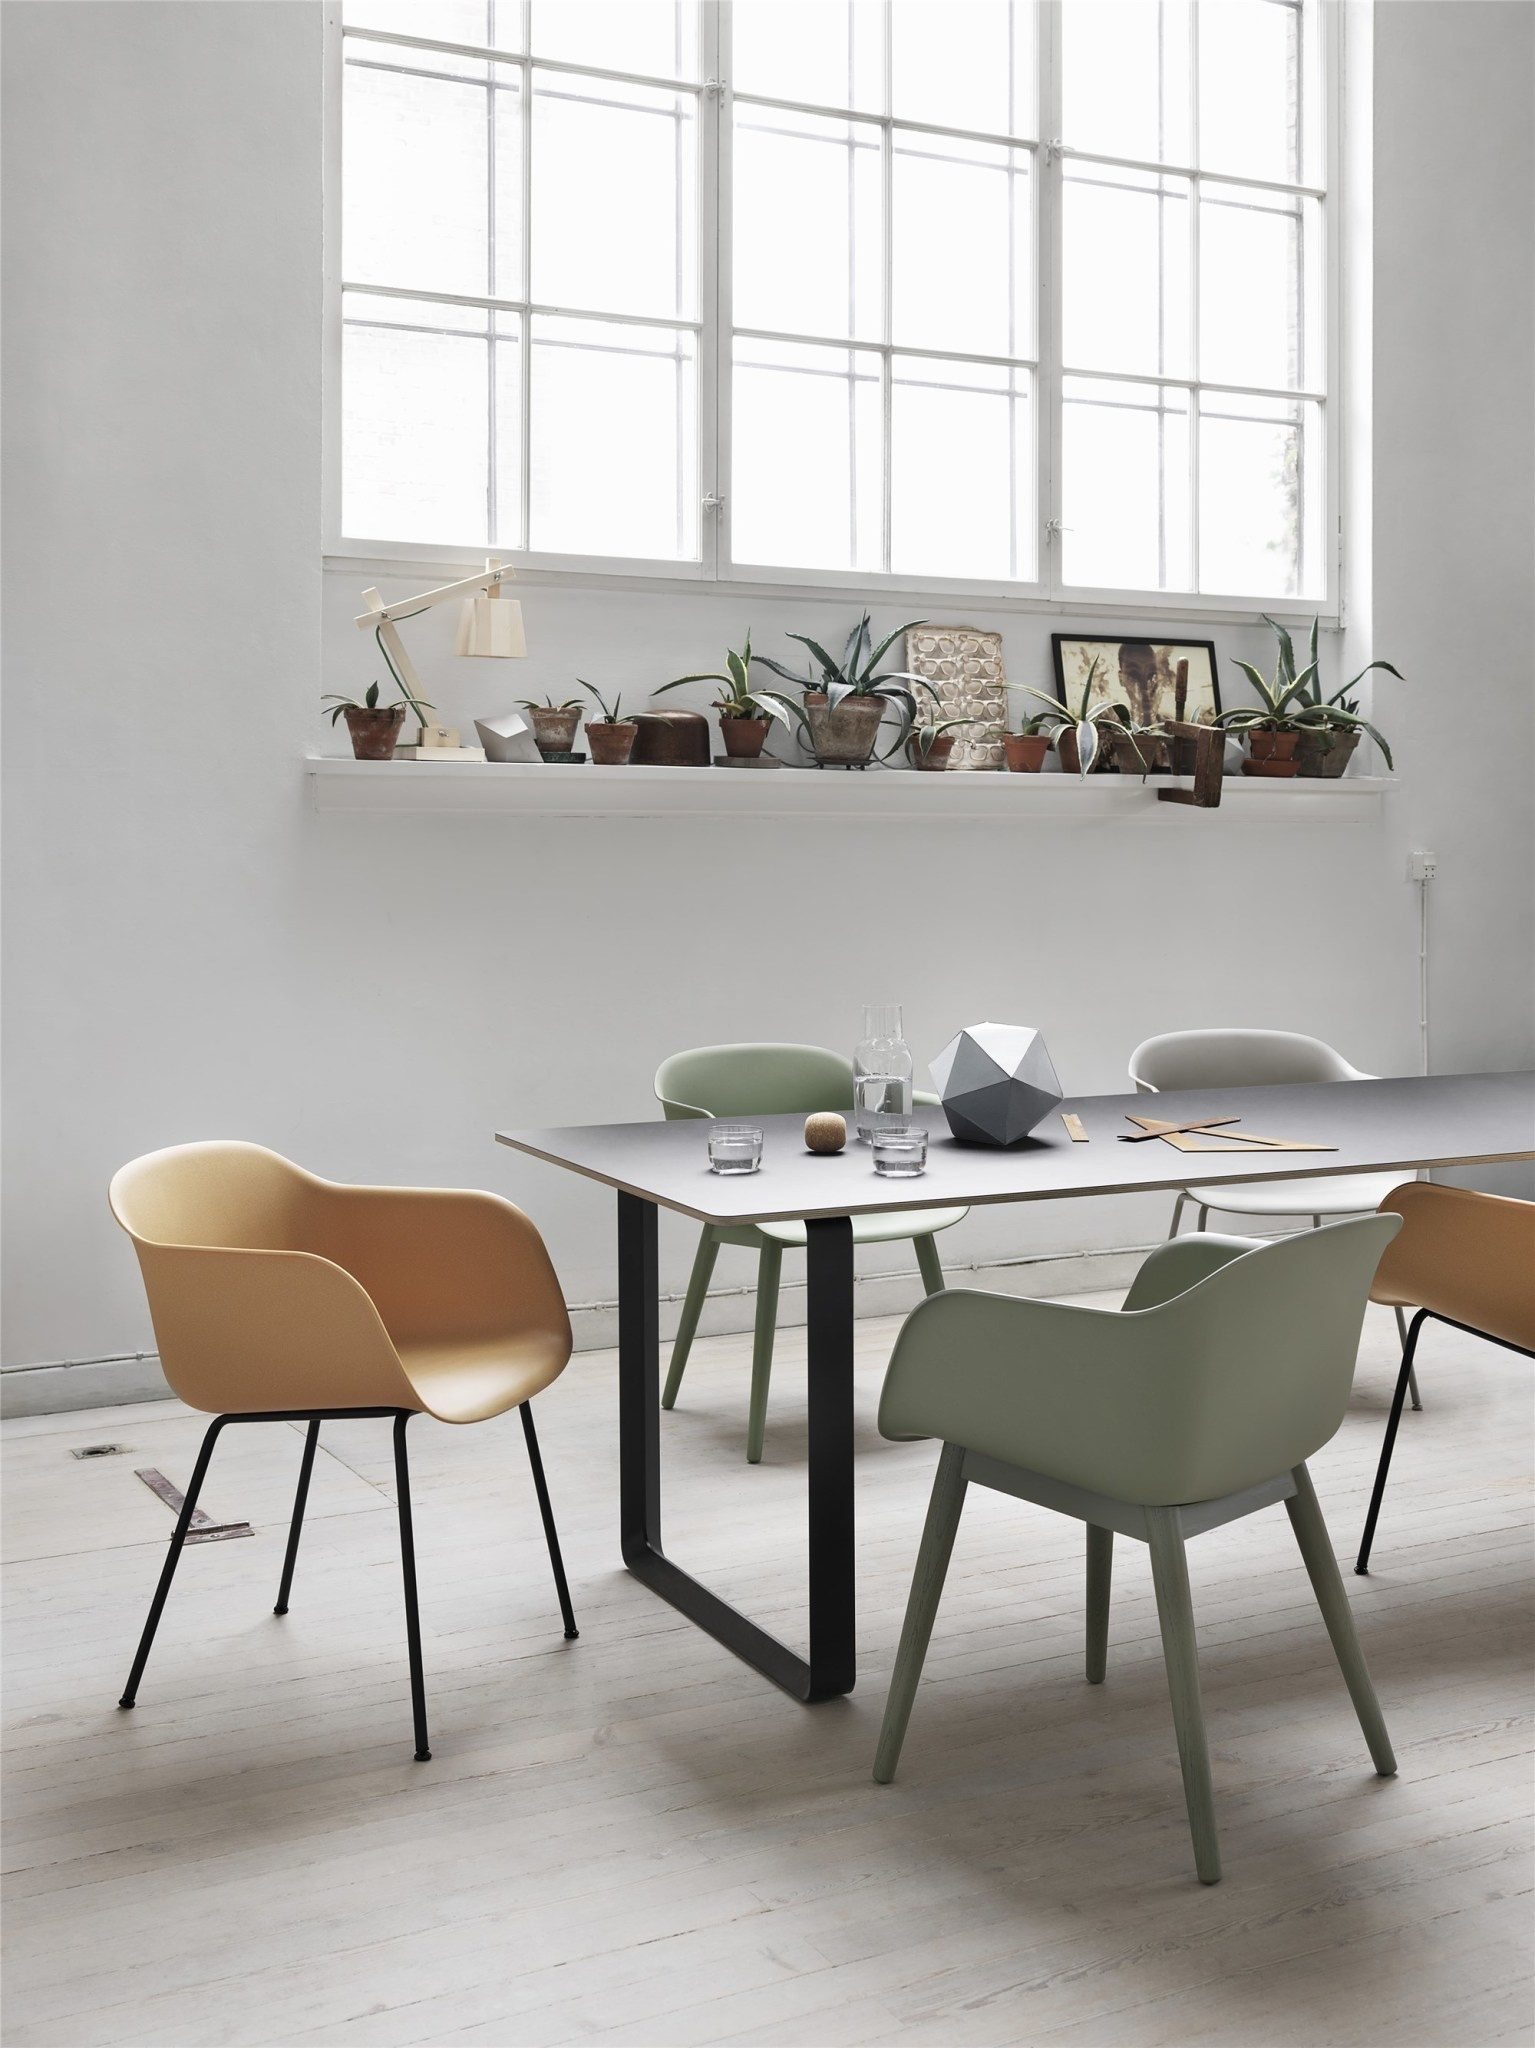 Fiber armchair wood base-2